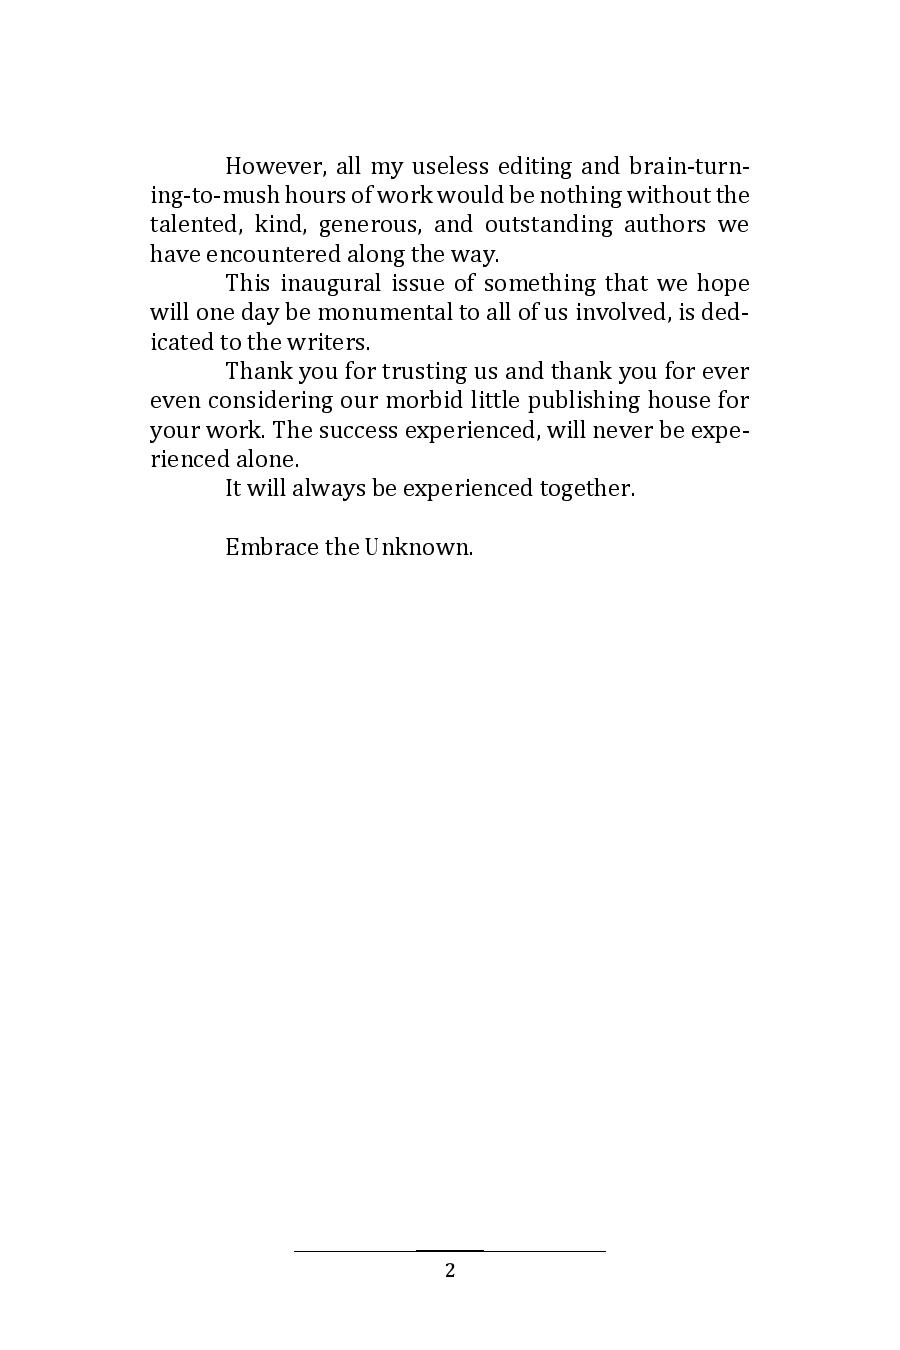 Hinnom Magazine 001 Manuscript 10-page-006